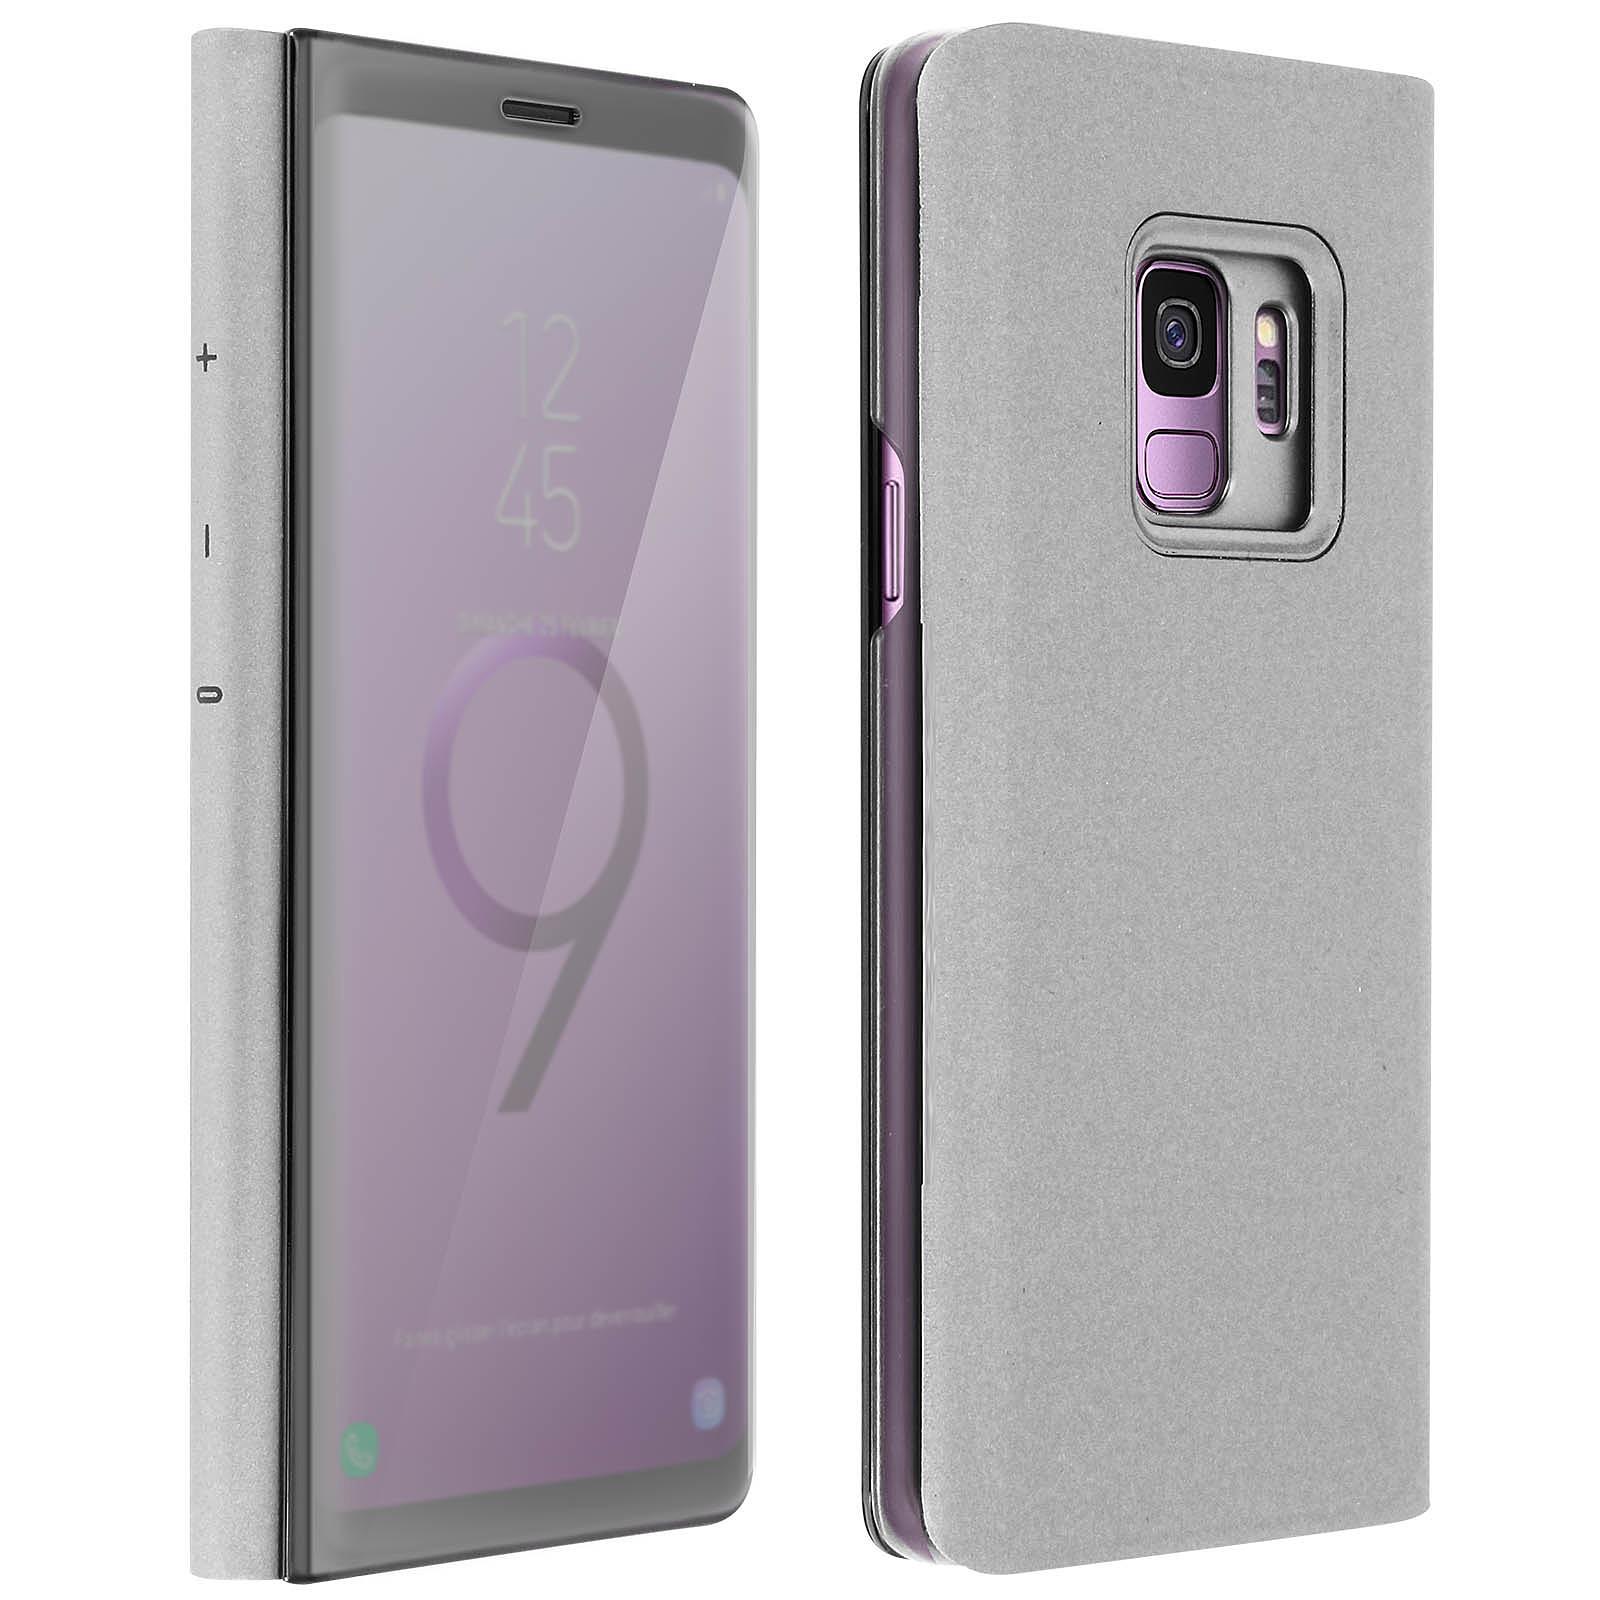 Avizar Etui folio Argent pour Samsung Galaxy S9